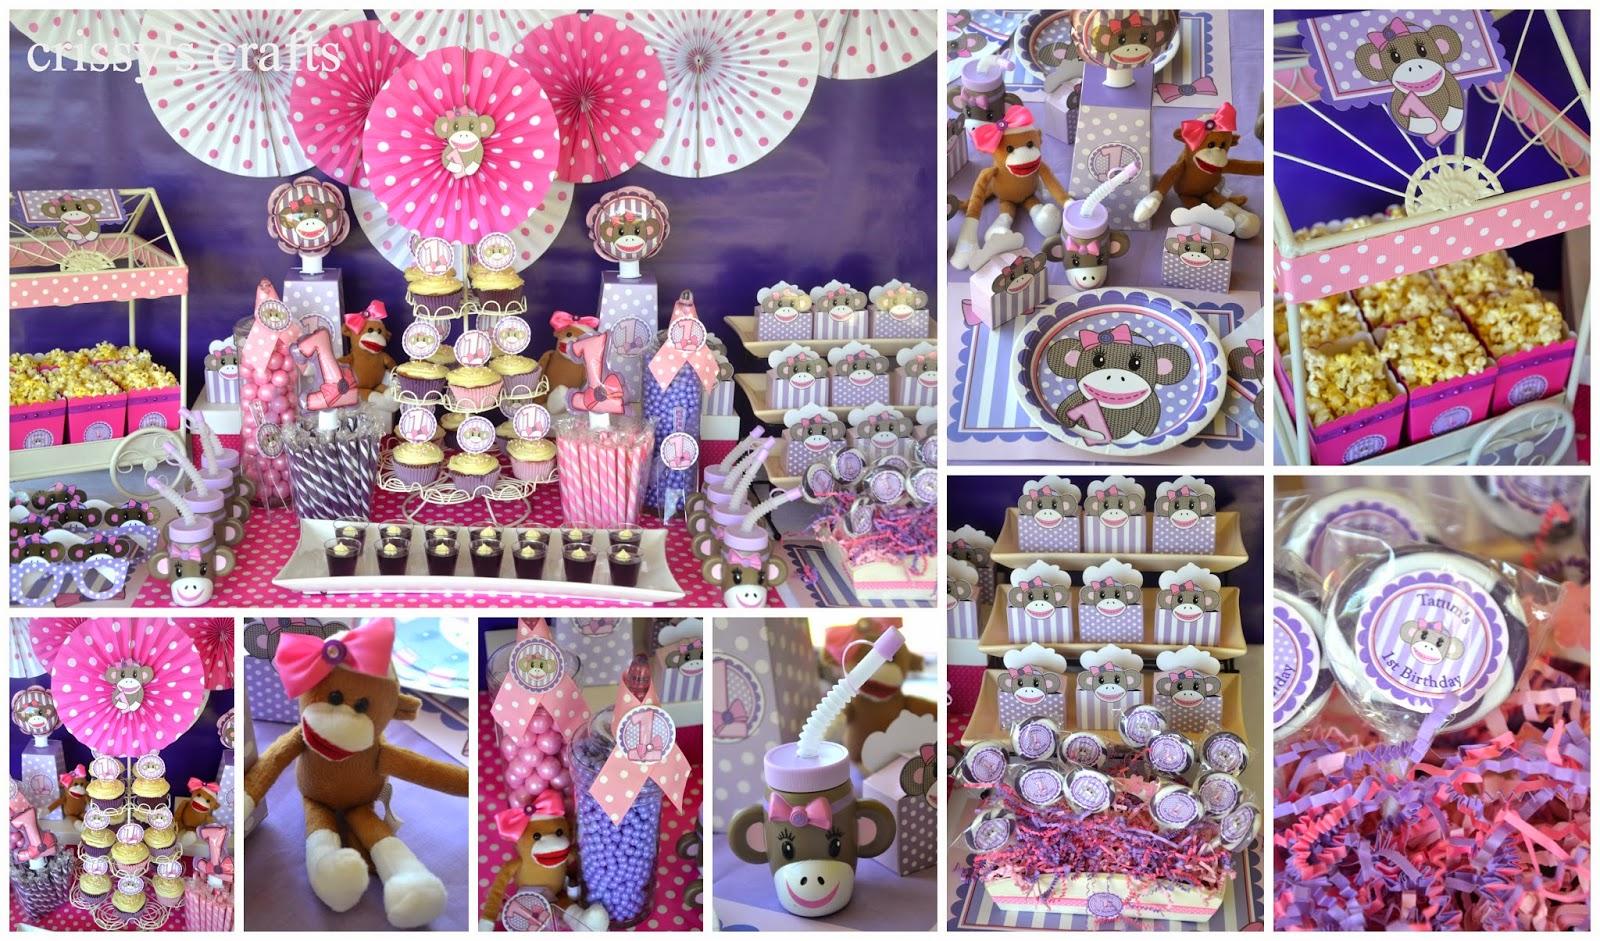 Crissys Crafts 1st Birthday Miss Sock Monkey Party